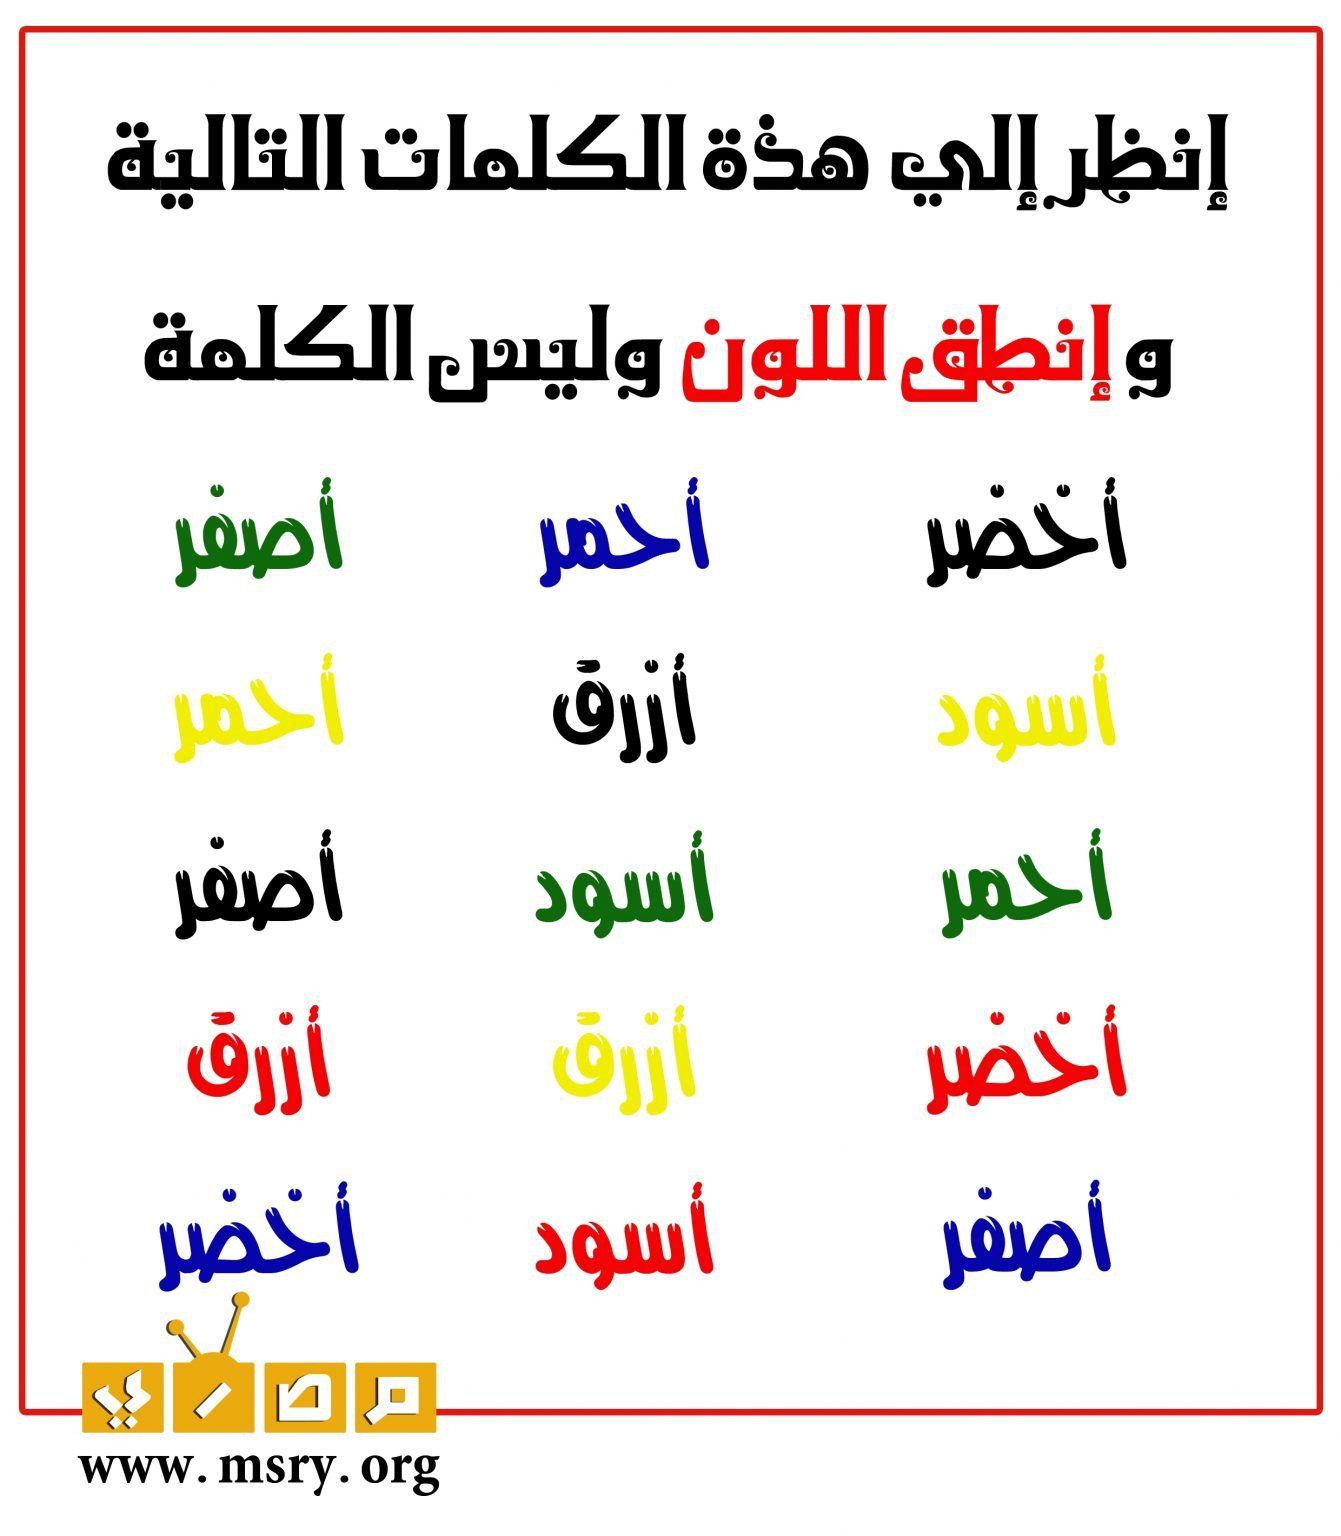 فوازير سهله واجابتها والغاز مصرية مضحكة للأطفال والكبار موقع مصري Funny Study Quotes Study Quotes Life Lessons